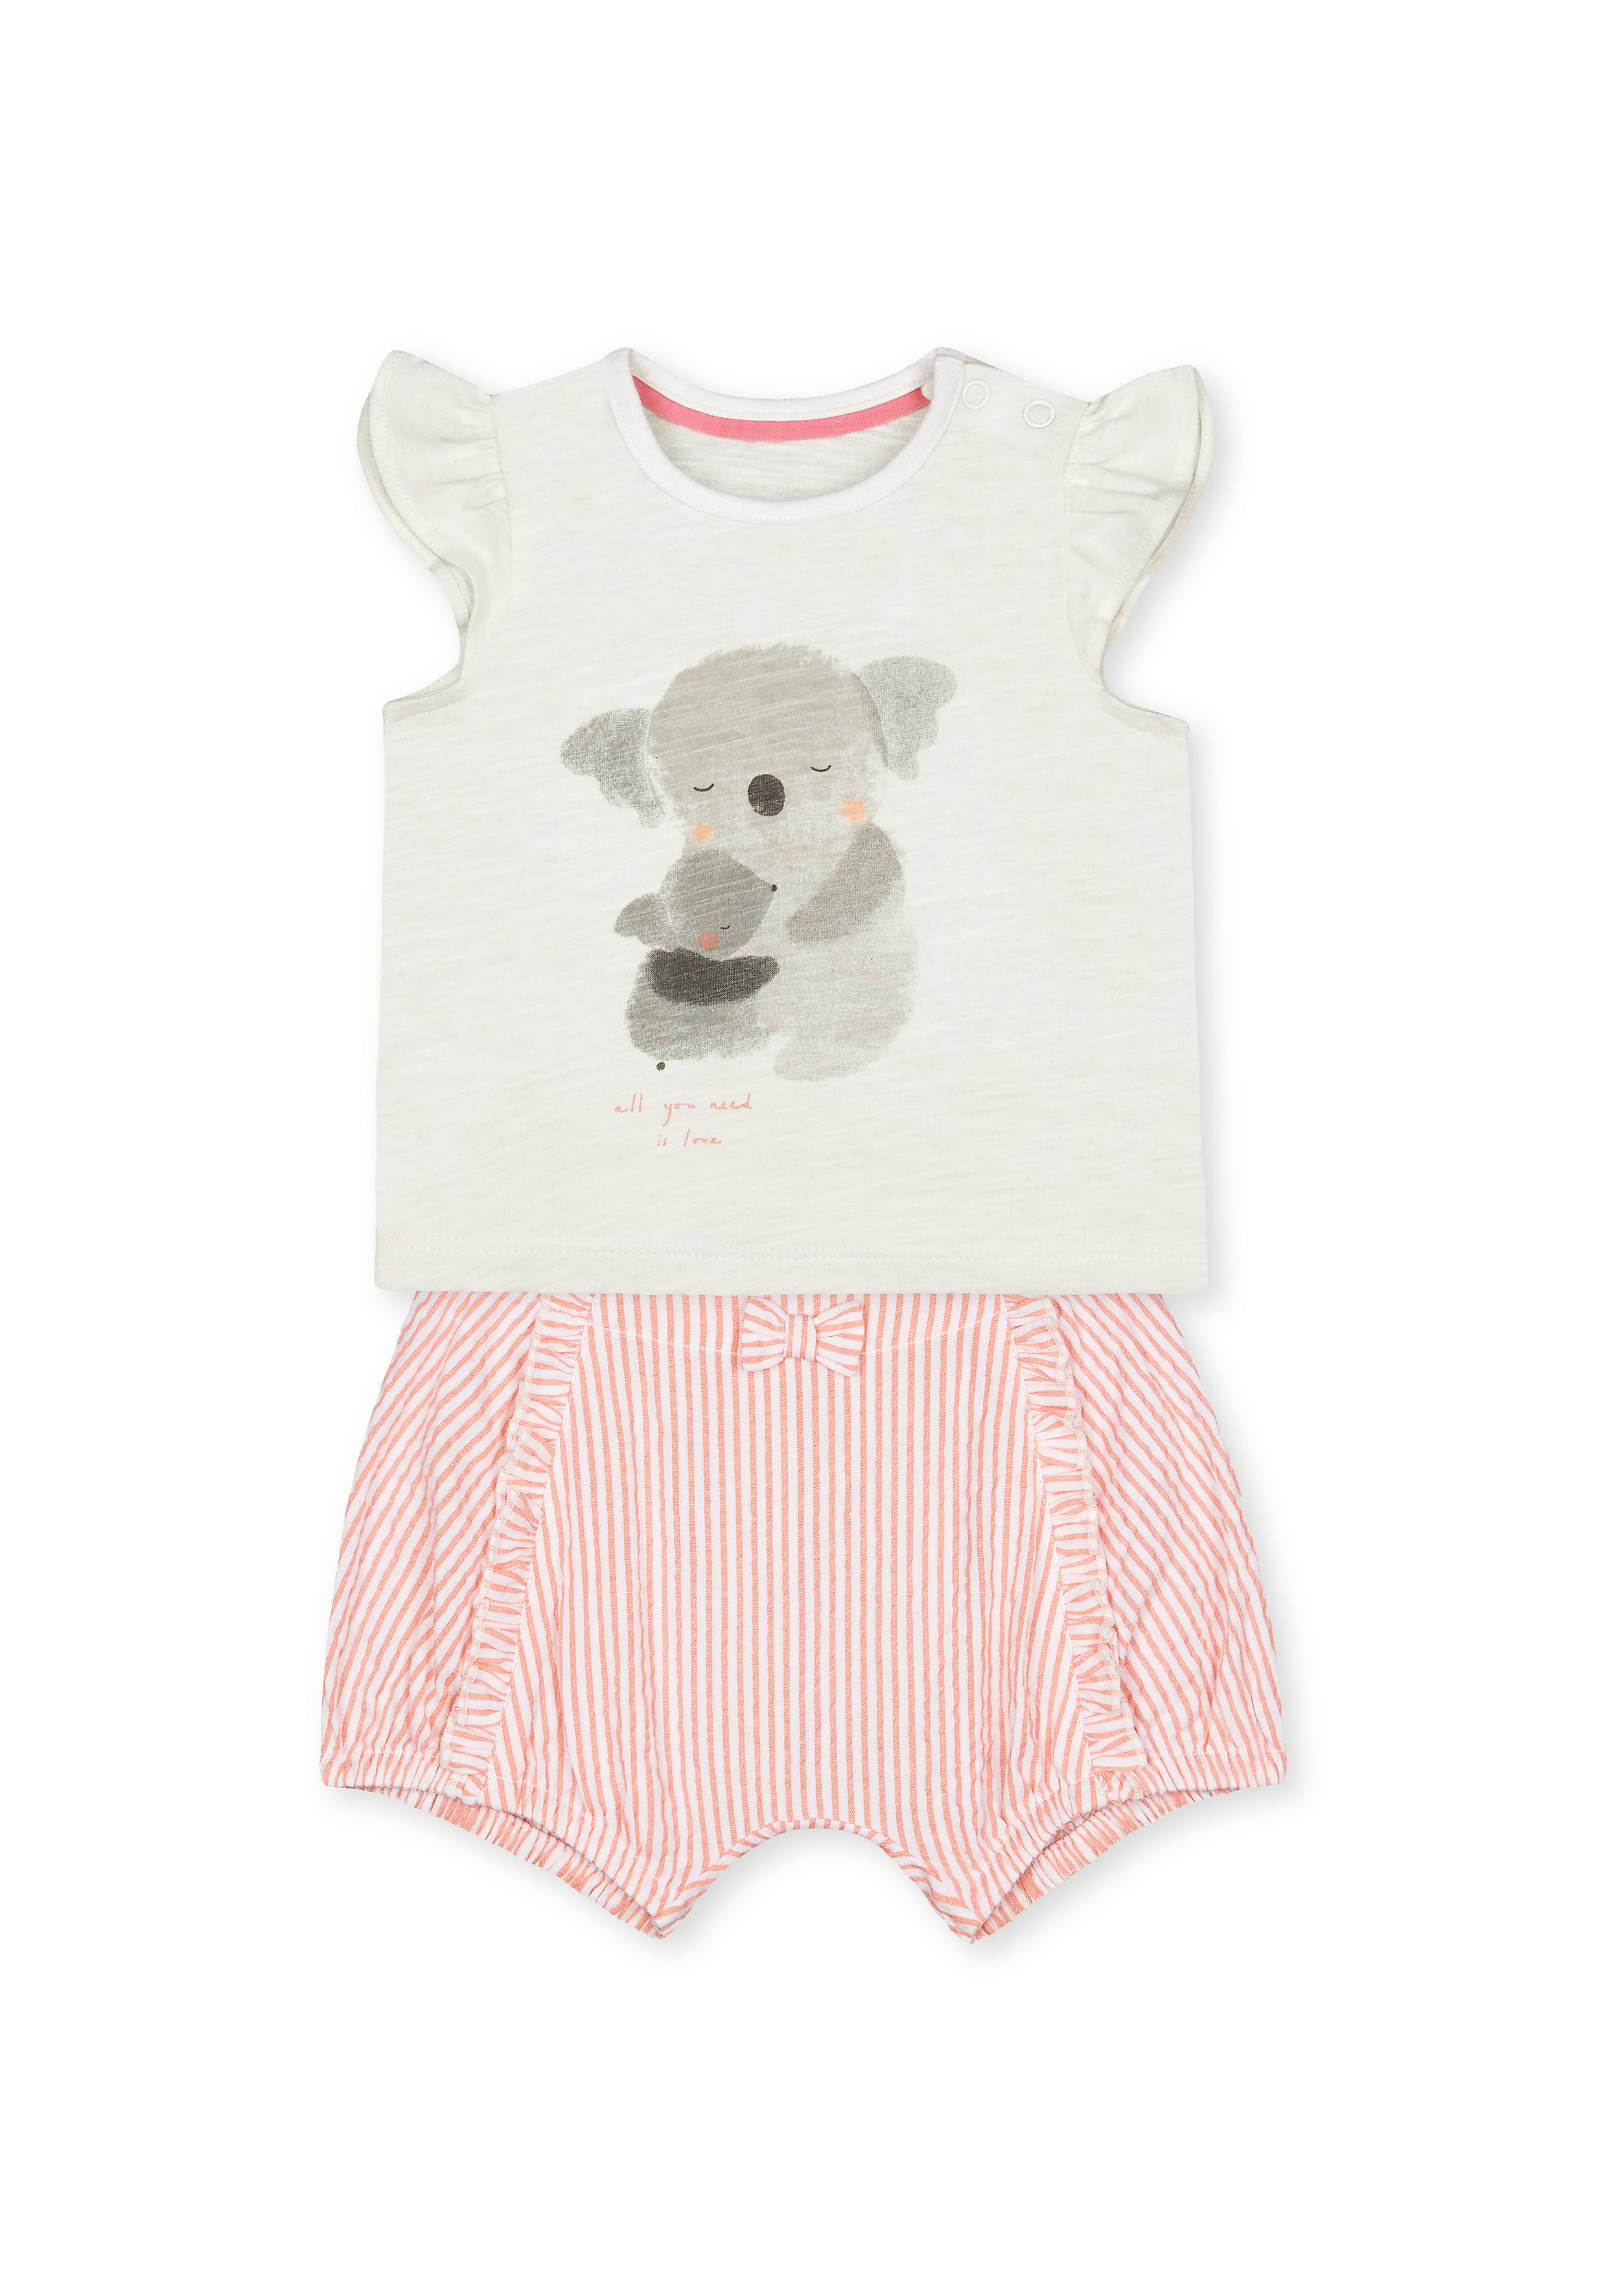 Mothercare | Girls Half Sleeves Koala Print Tee And Shorts Set - Pink White